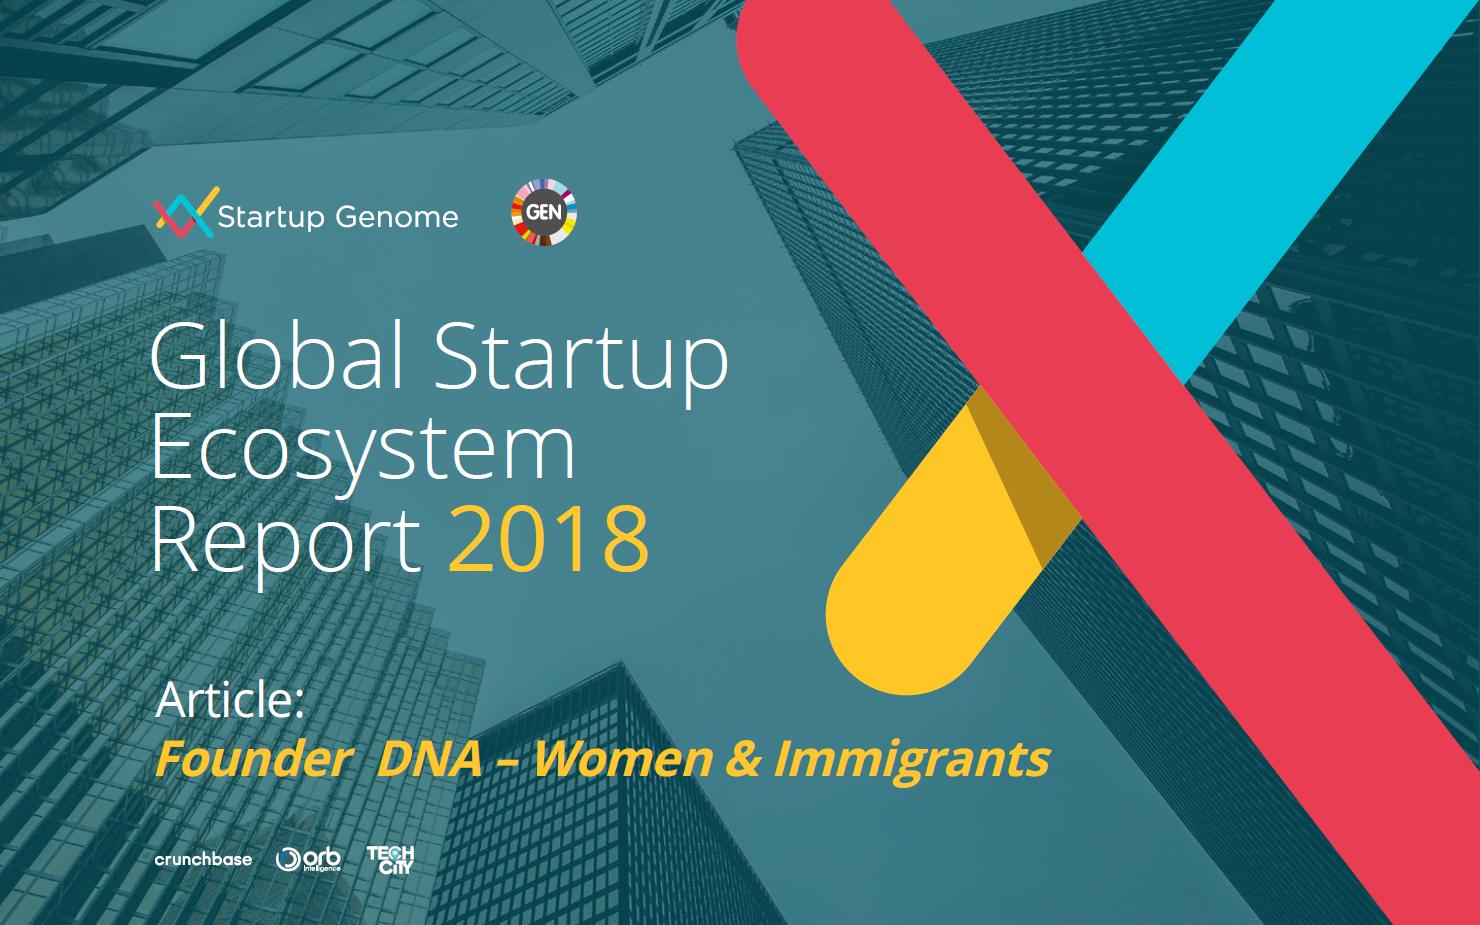 Founder DNA - Women & Immigrants